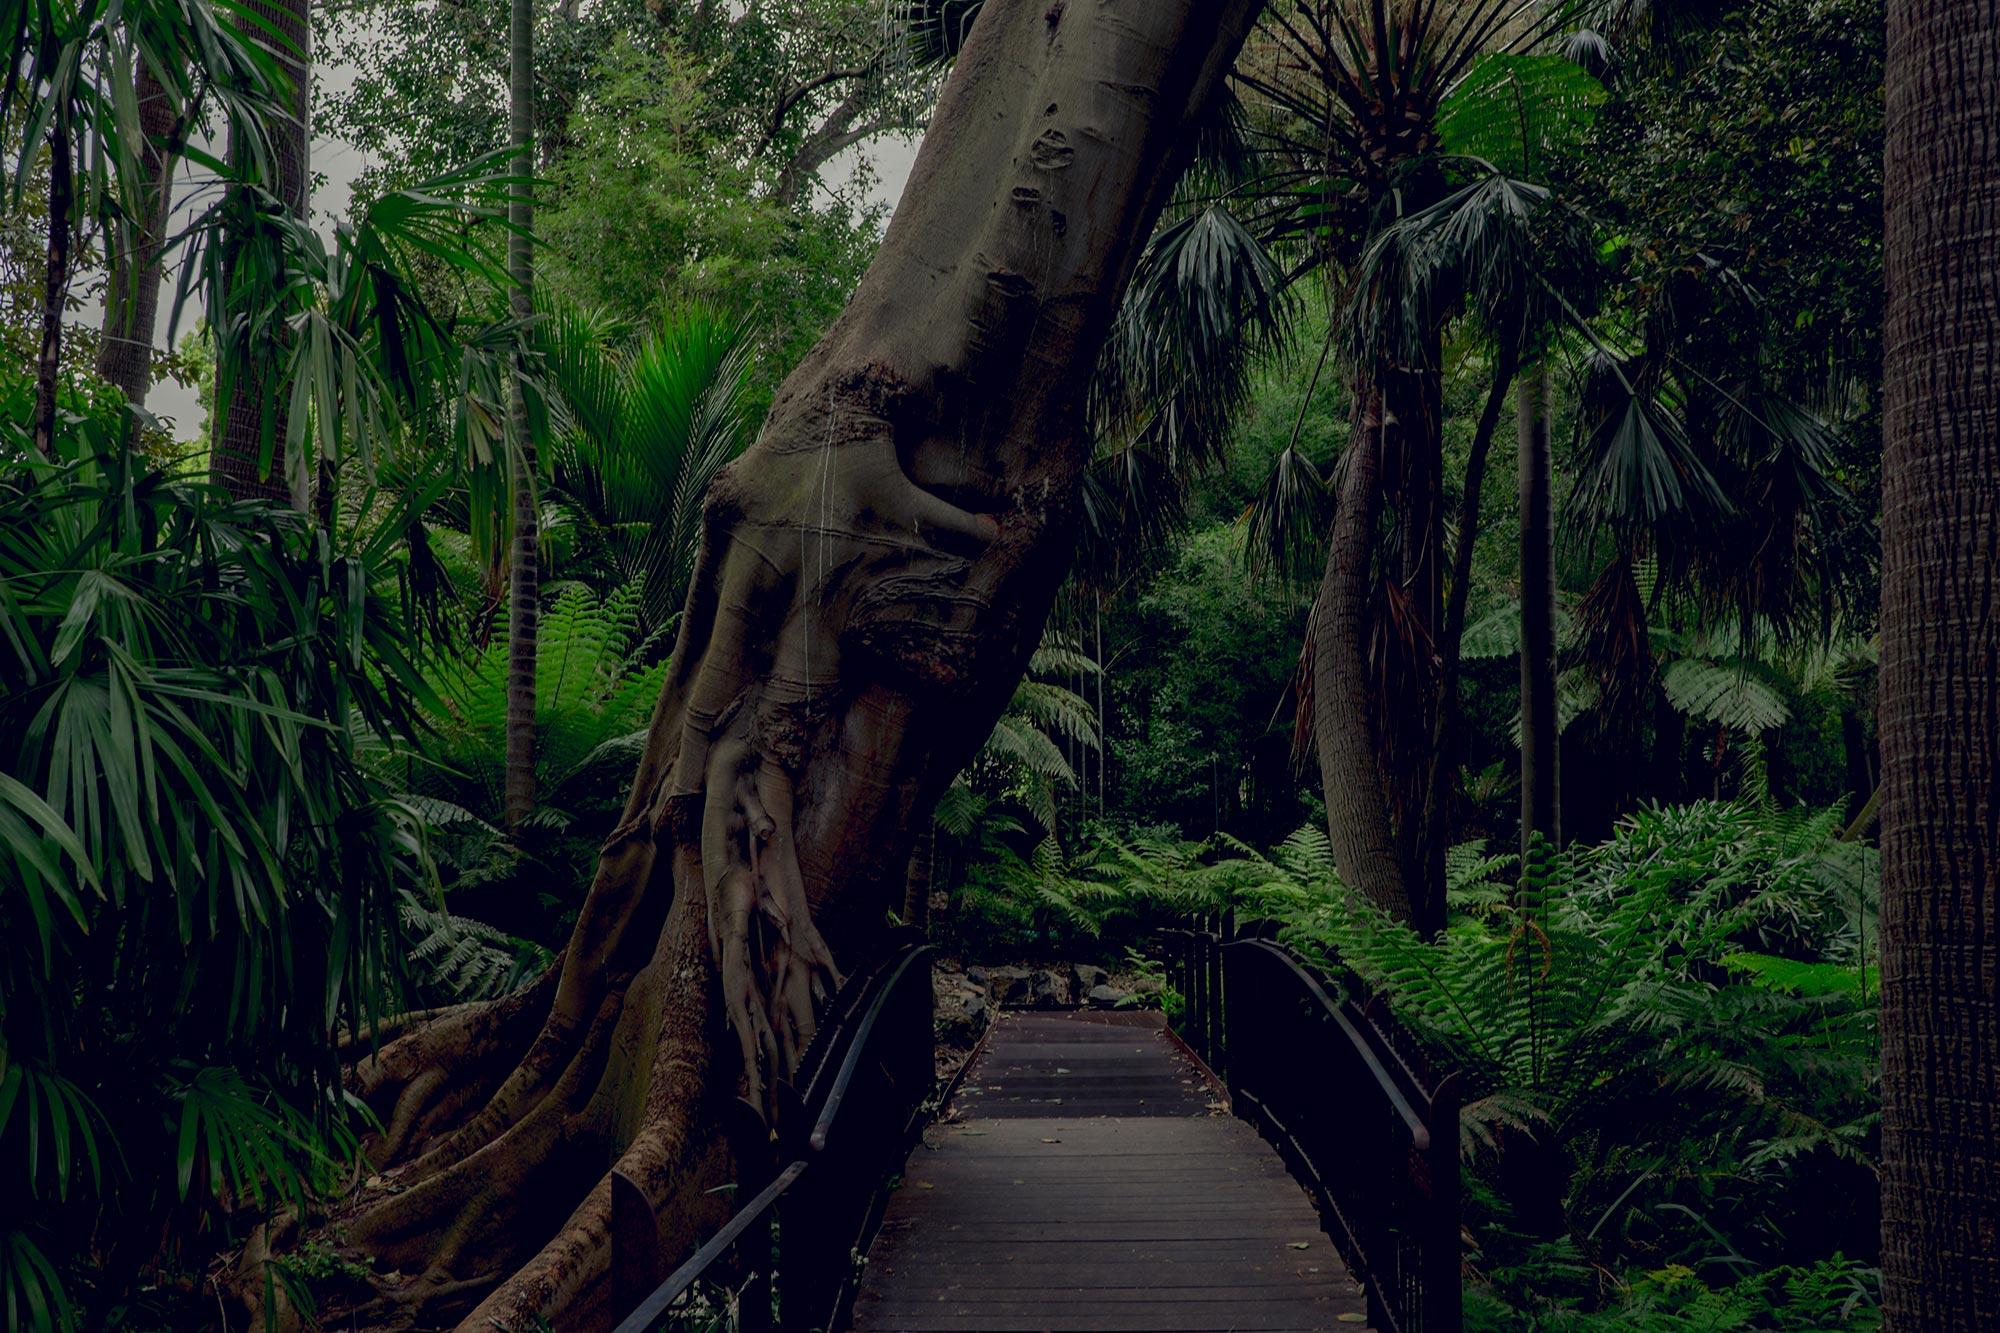 australia-melbourne-royal-botanic-gardens6